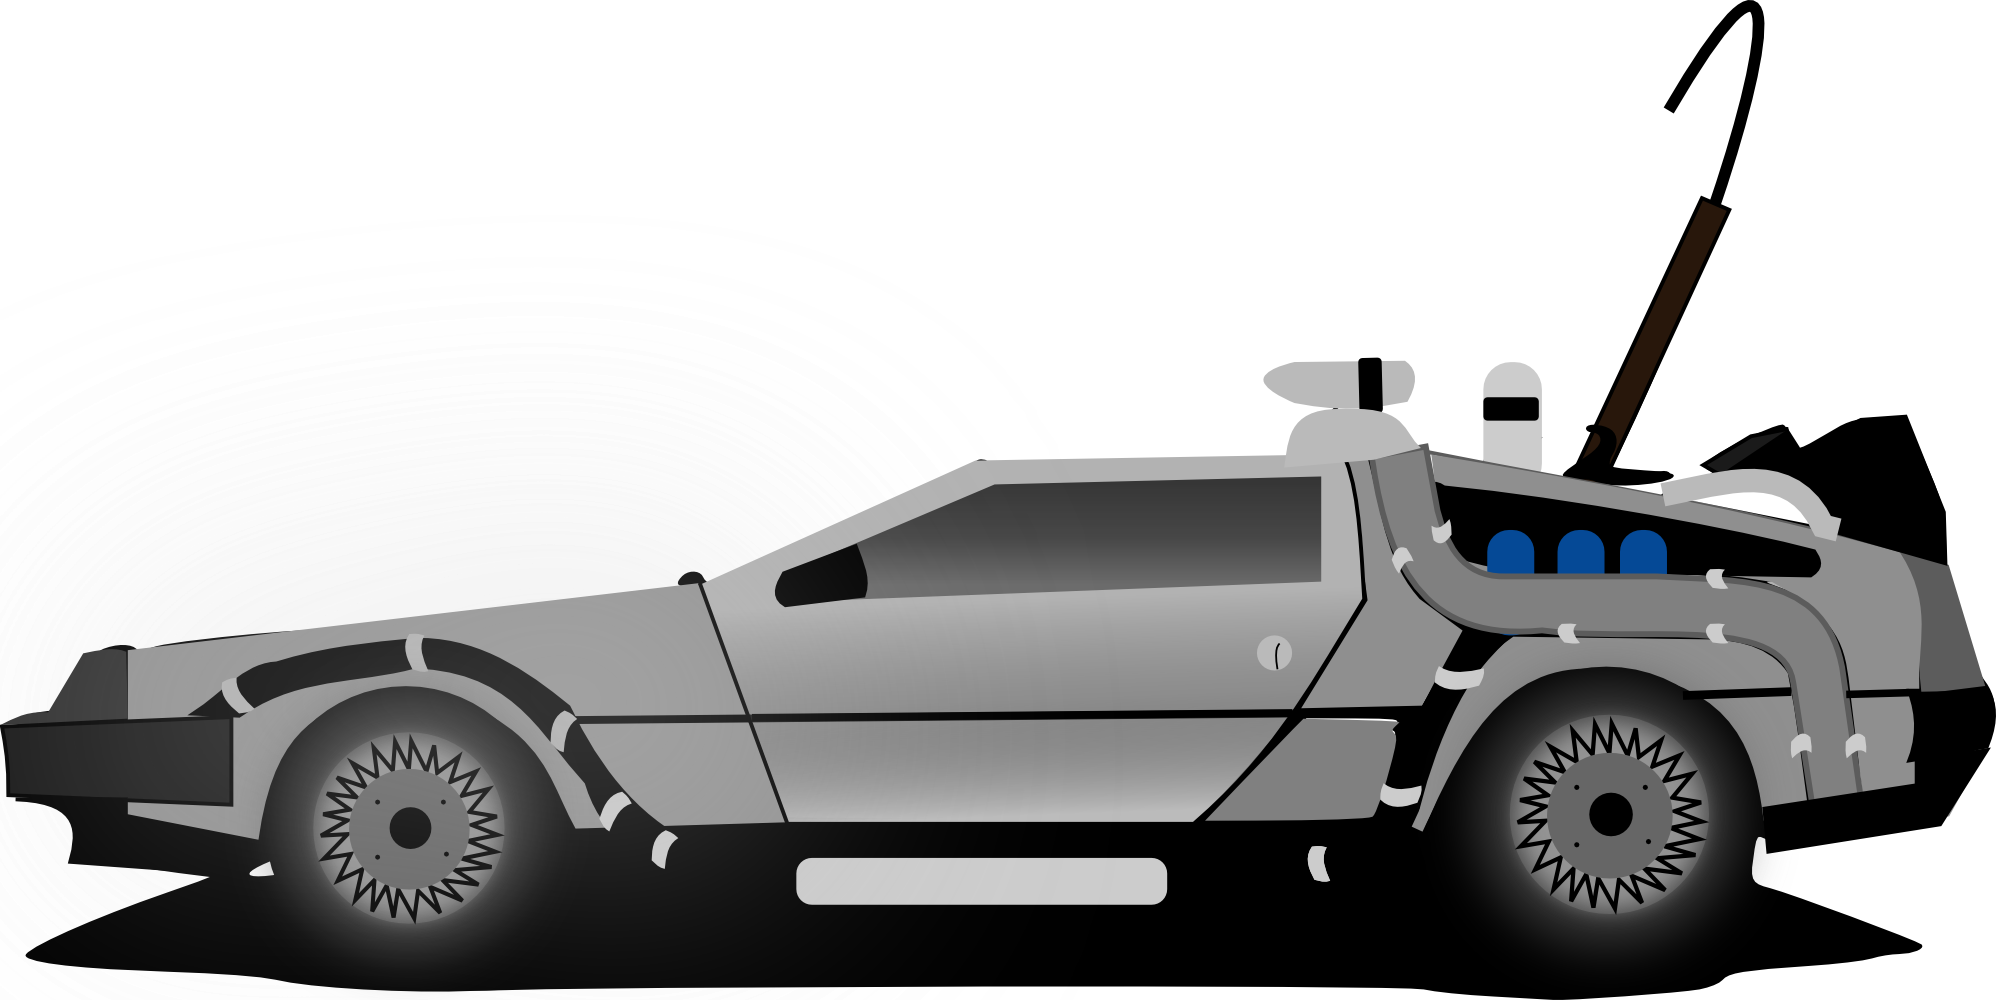 Delorean Flying Car Car Delorean